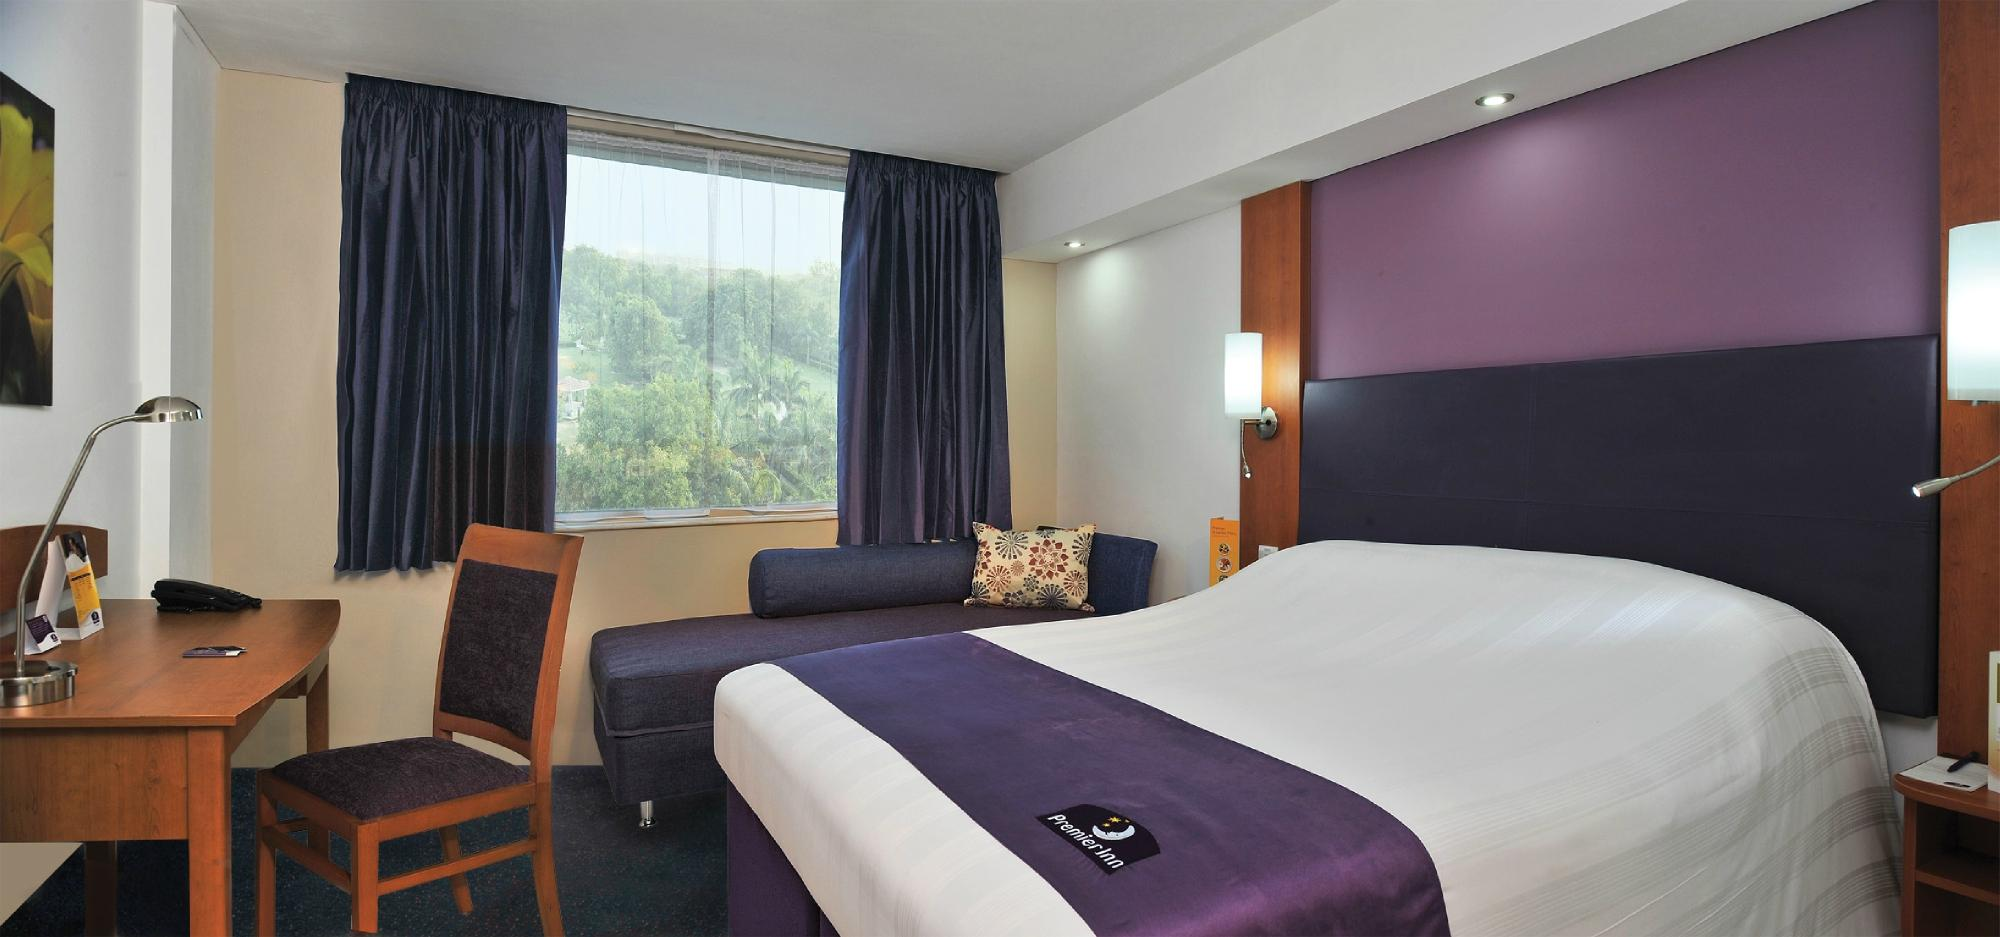 Premier Inn Gatwick Crawley Town (Goff's Park) Hotel